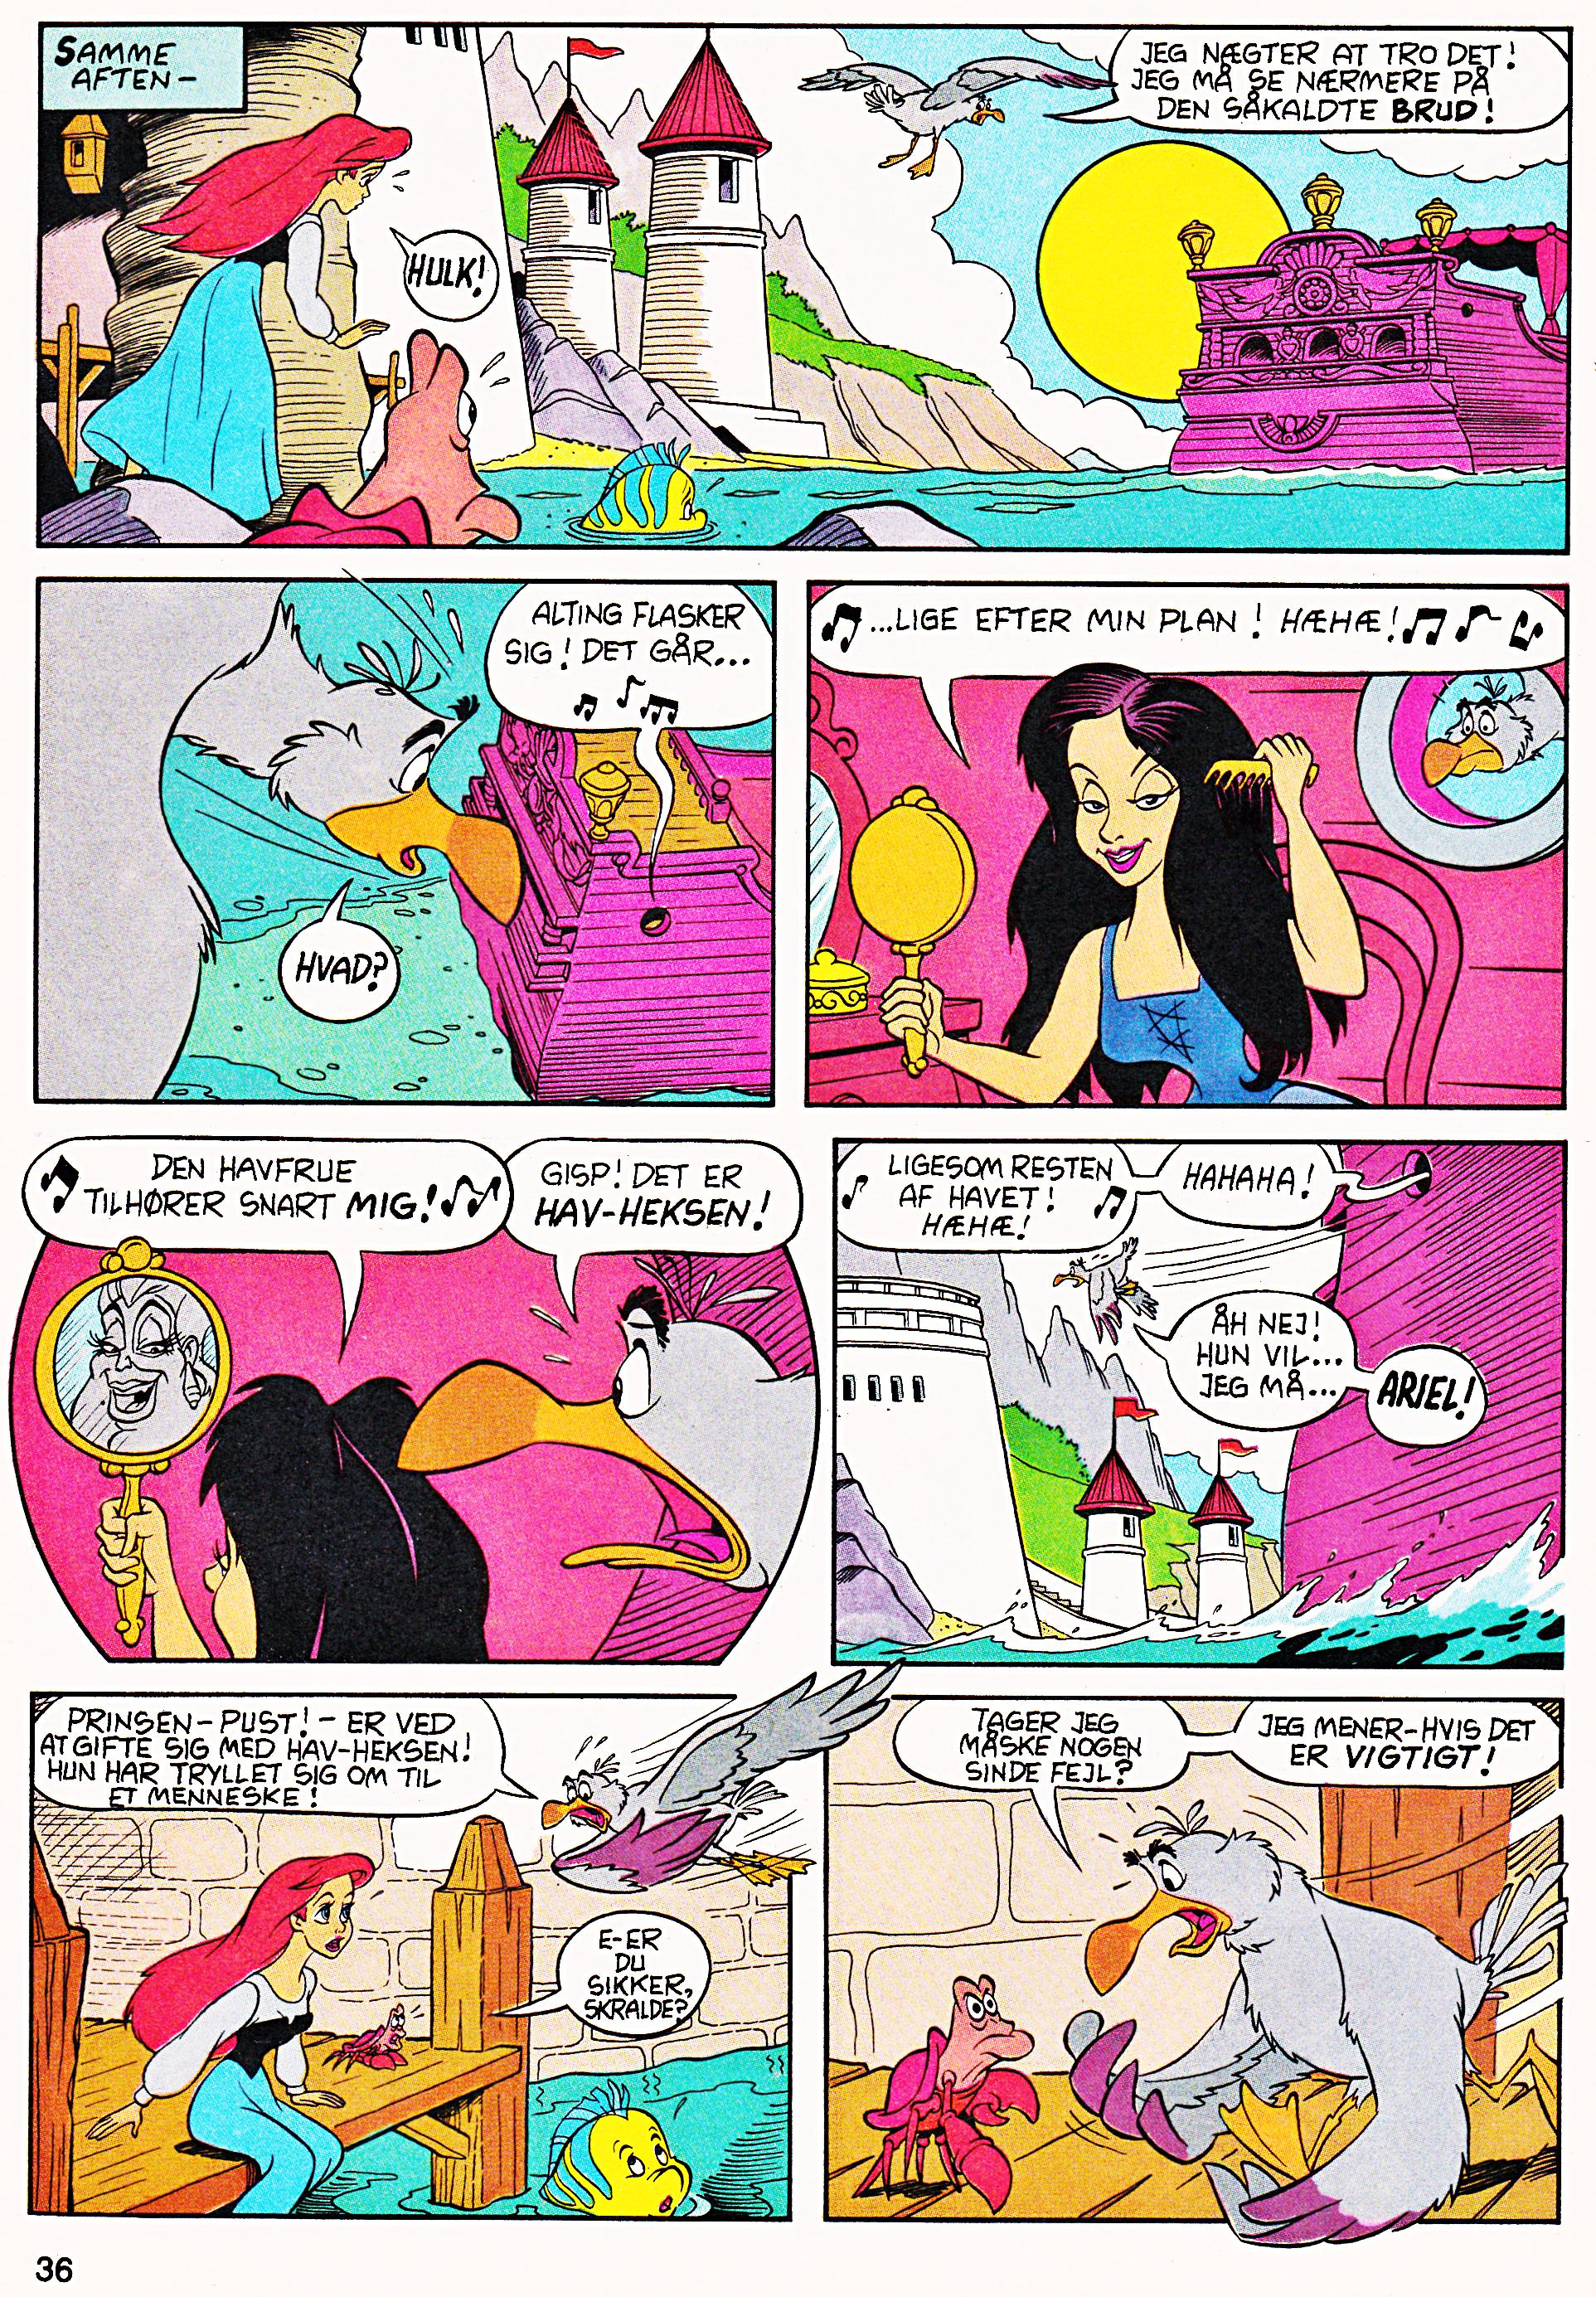 Walt disney Movie Comics - The Little Mermaid (Danish Edition)